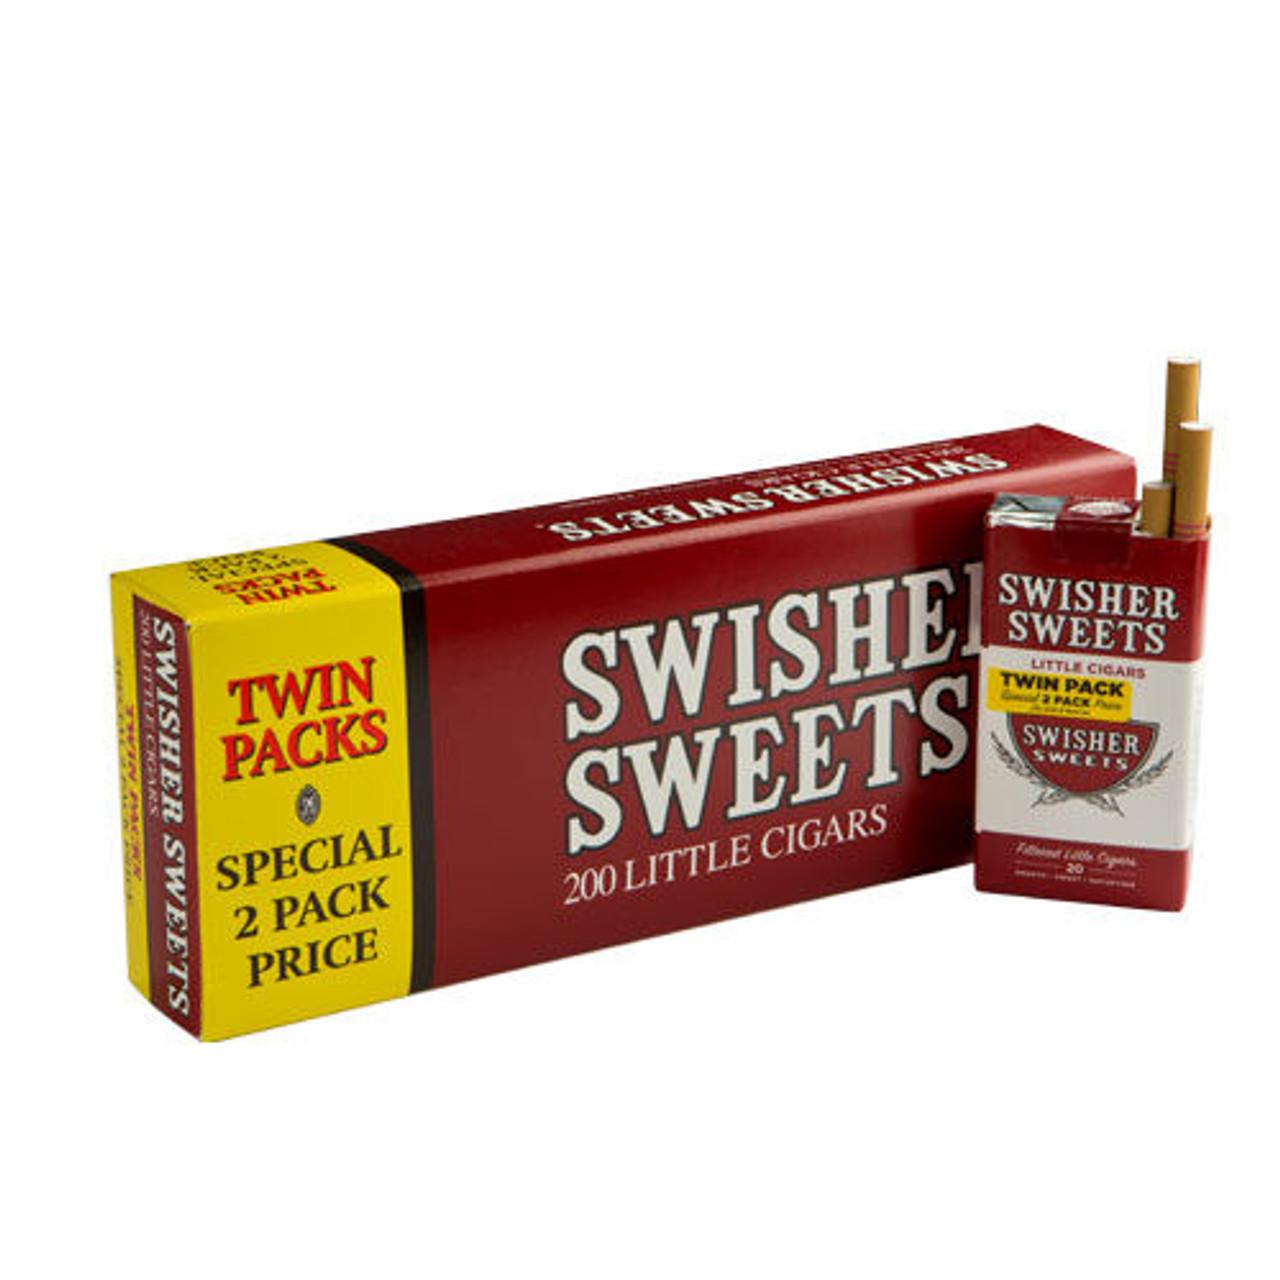 Swisher Sweets Little Cigars Regular - 3.75 x 24 (5 Packs of 40 (200 Total))